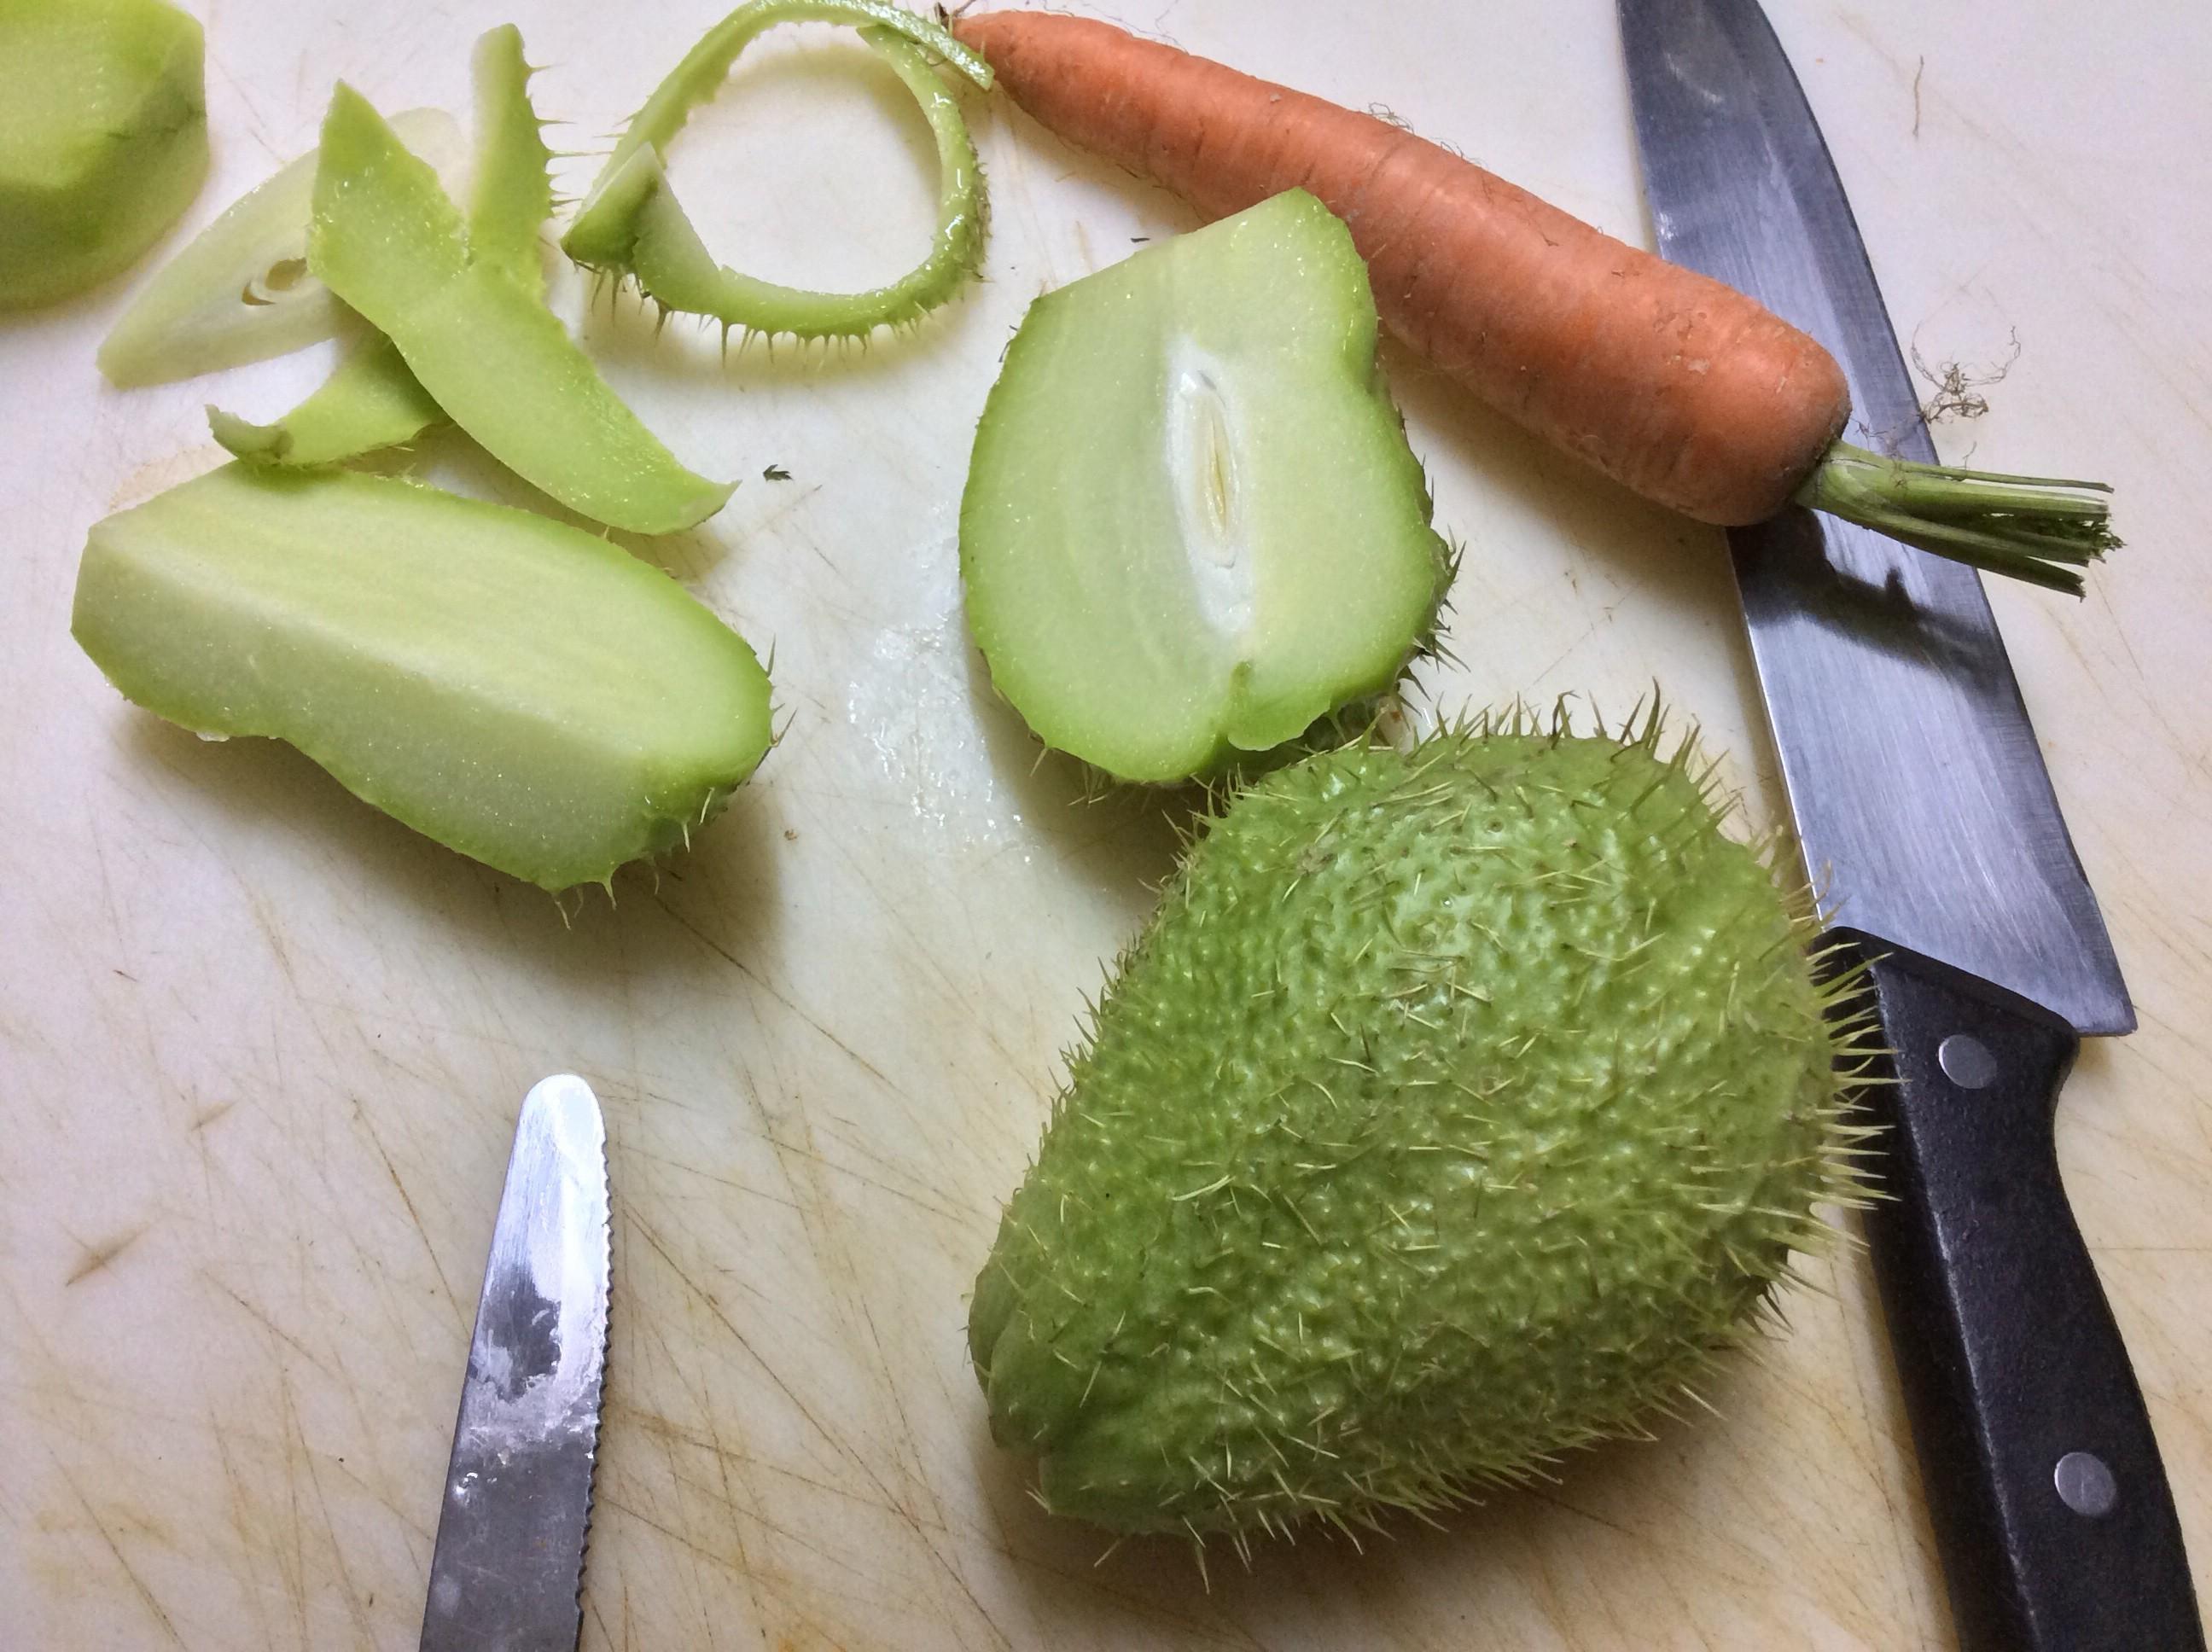 Minestra di zucchina spinosa o centenaria